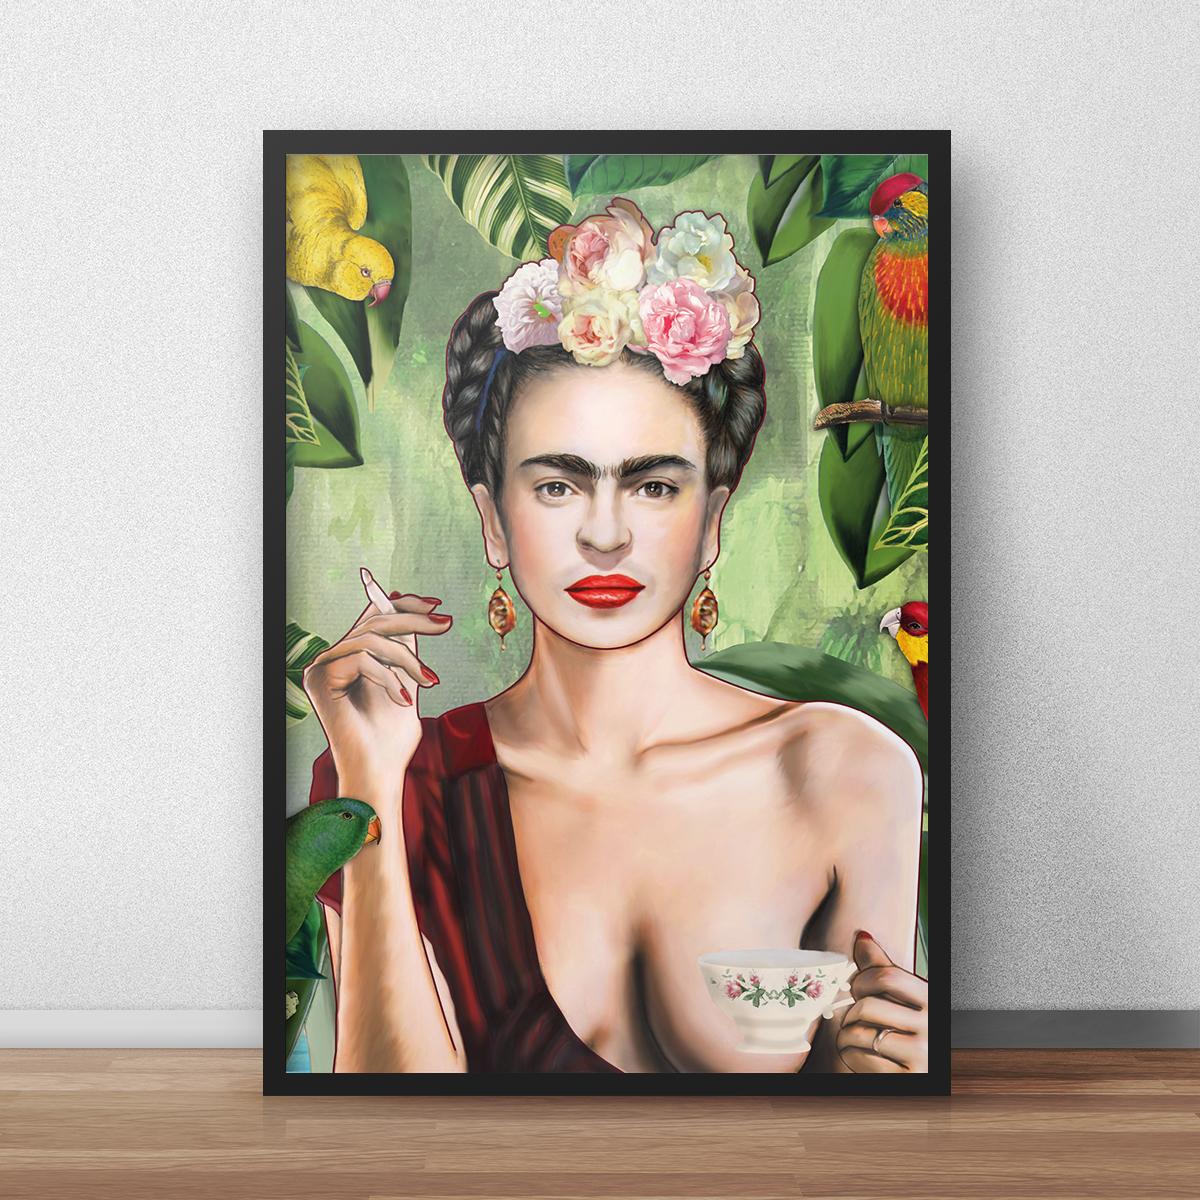 Poster Frida by Nettsch